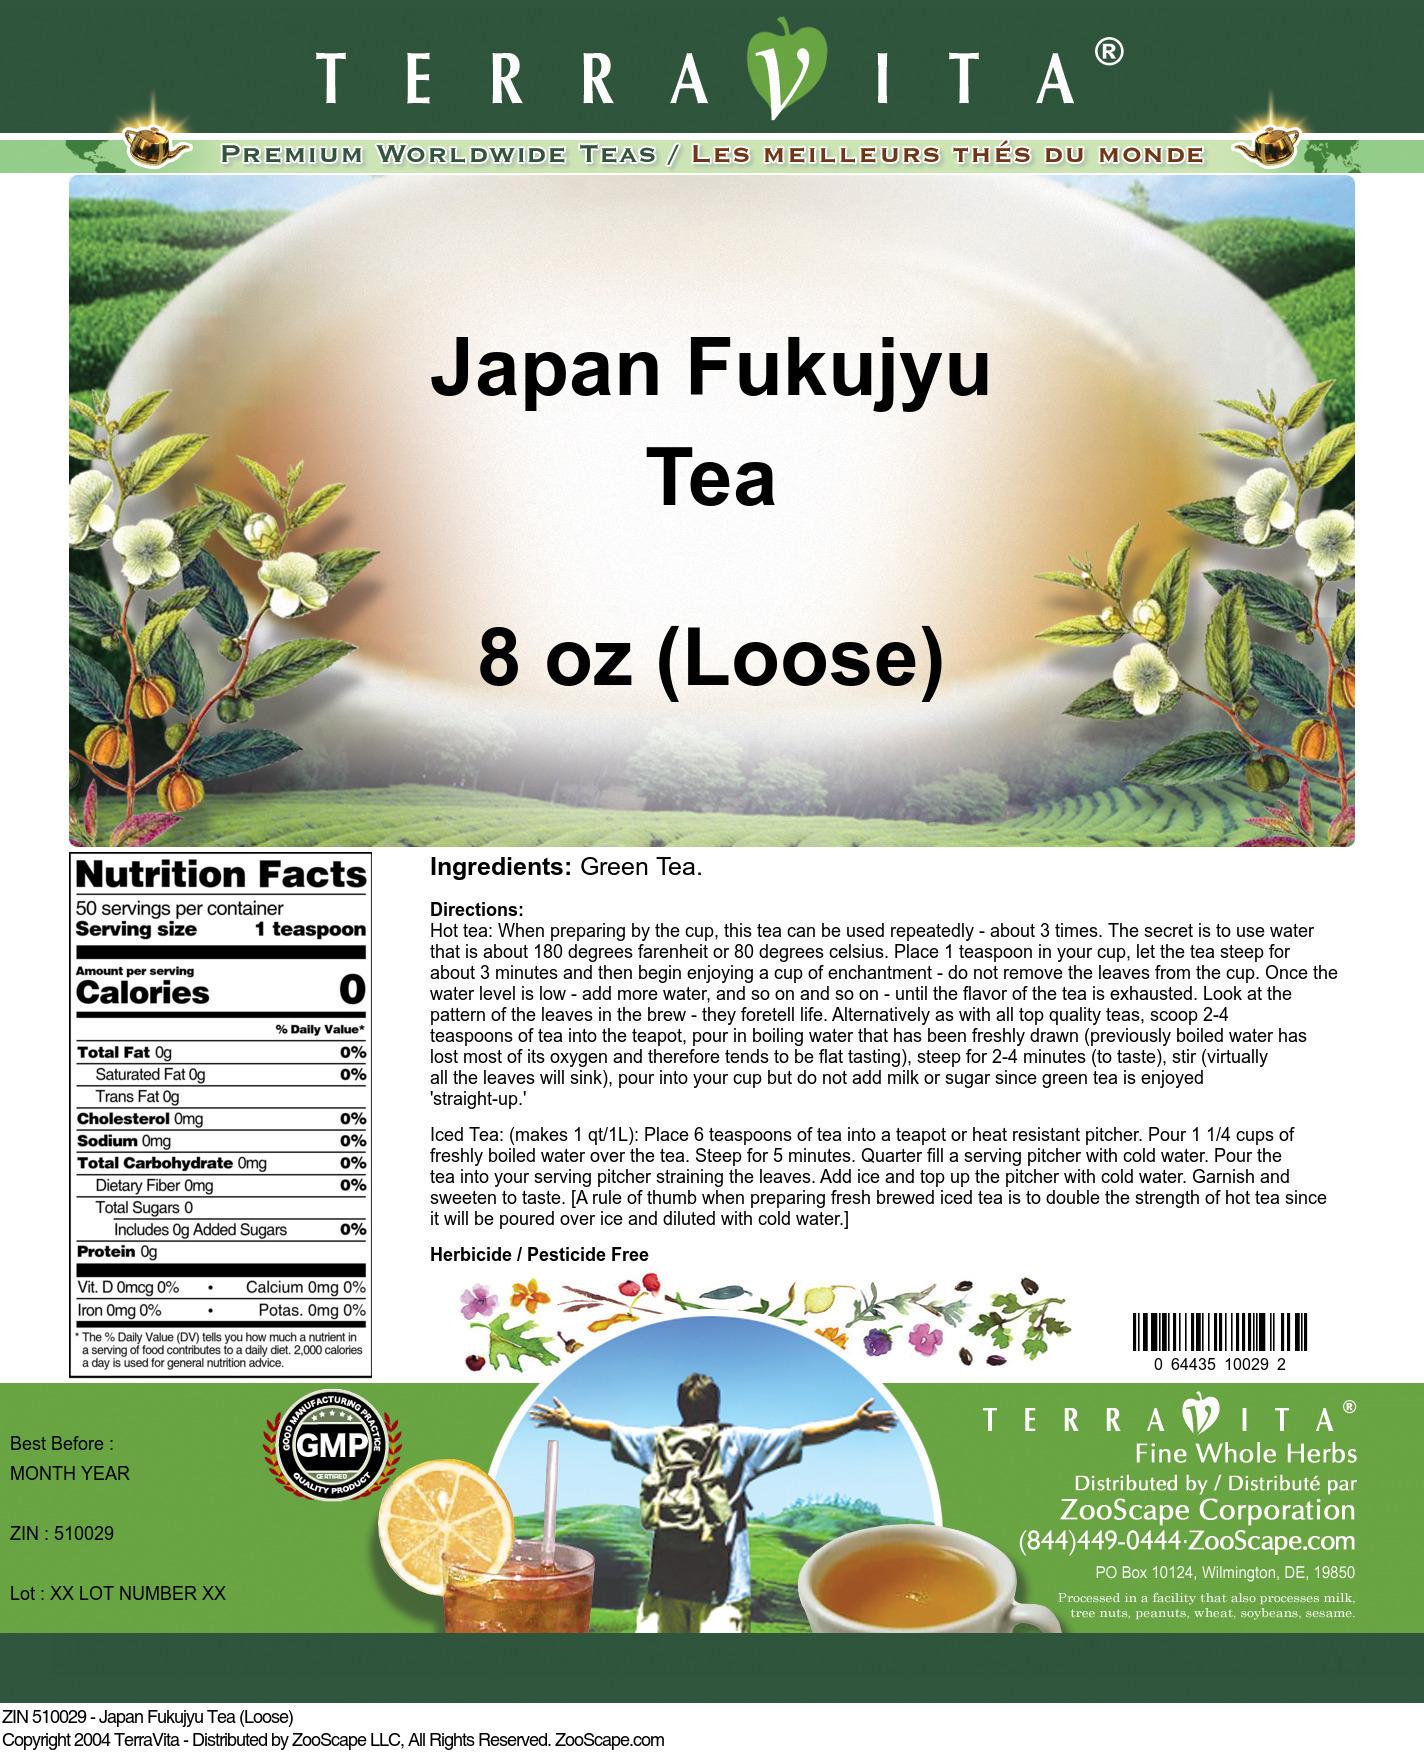 Japan Fukujyu Tea (Loose) - Label